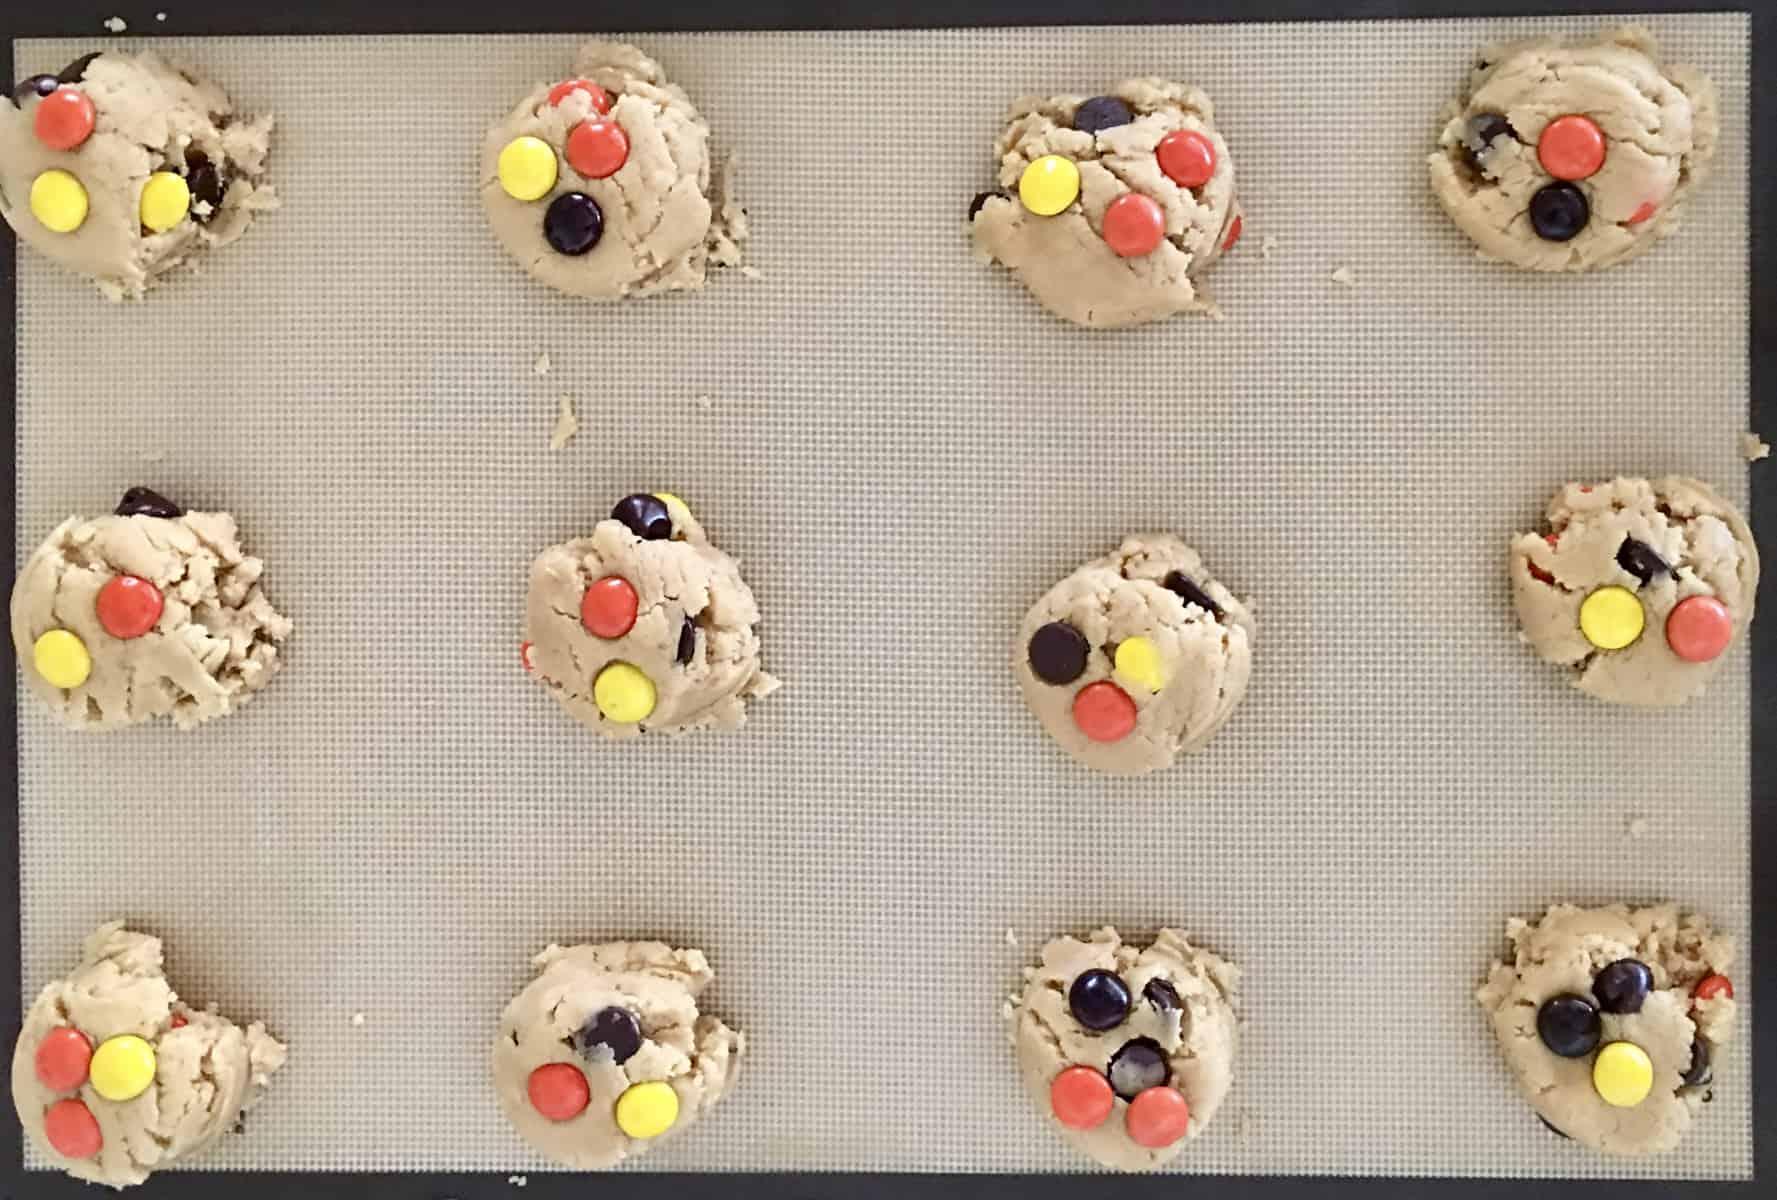 cookie batter on a baking sheet.